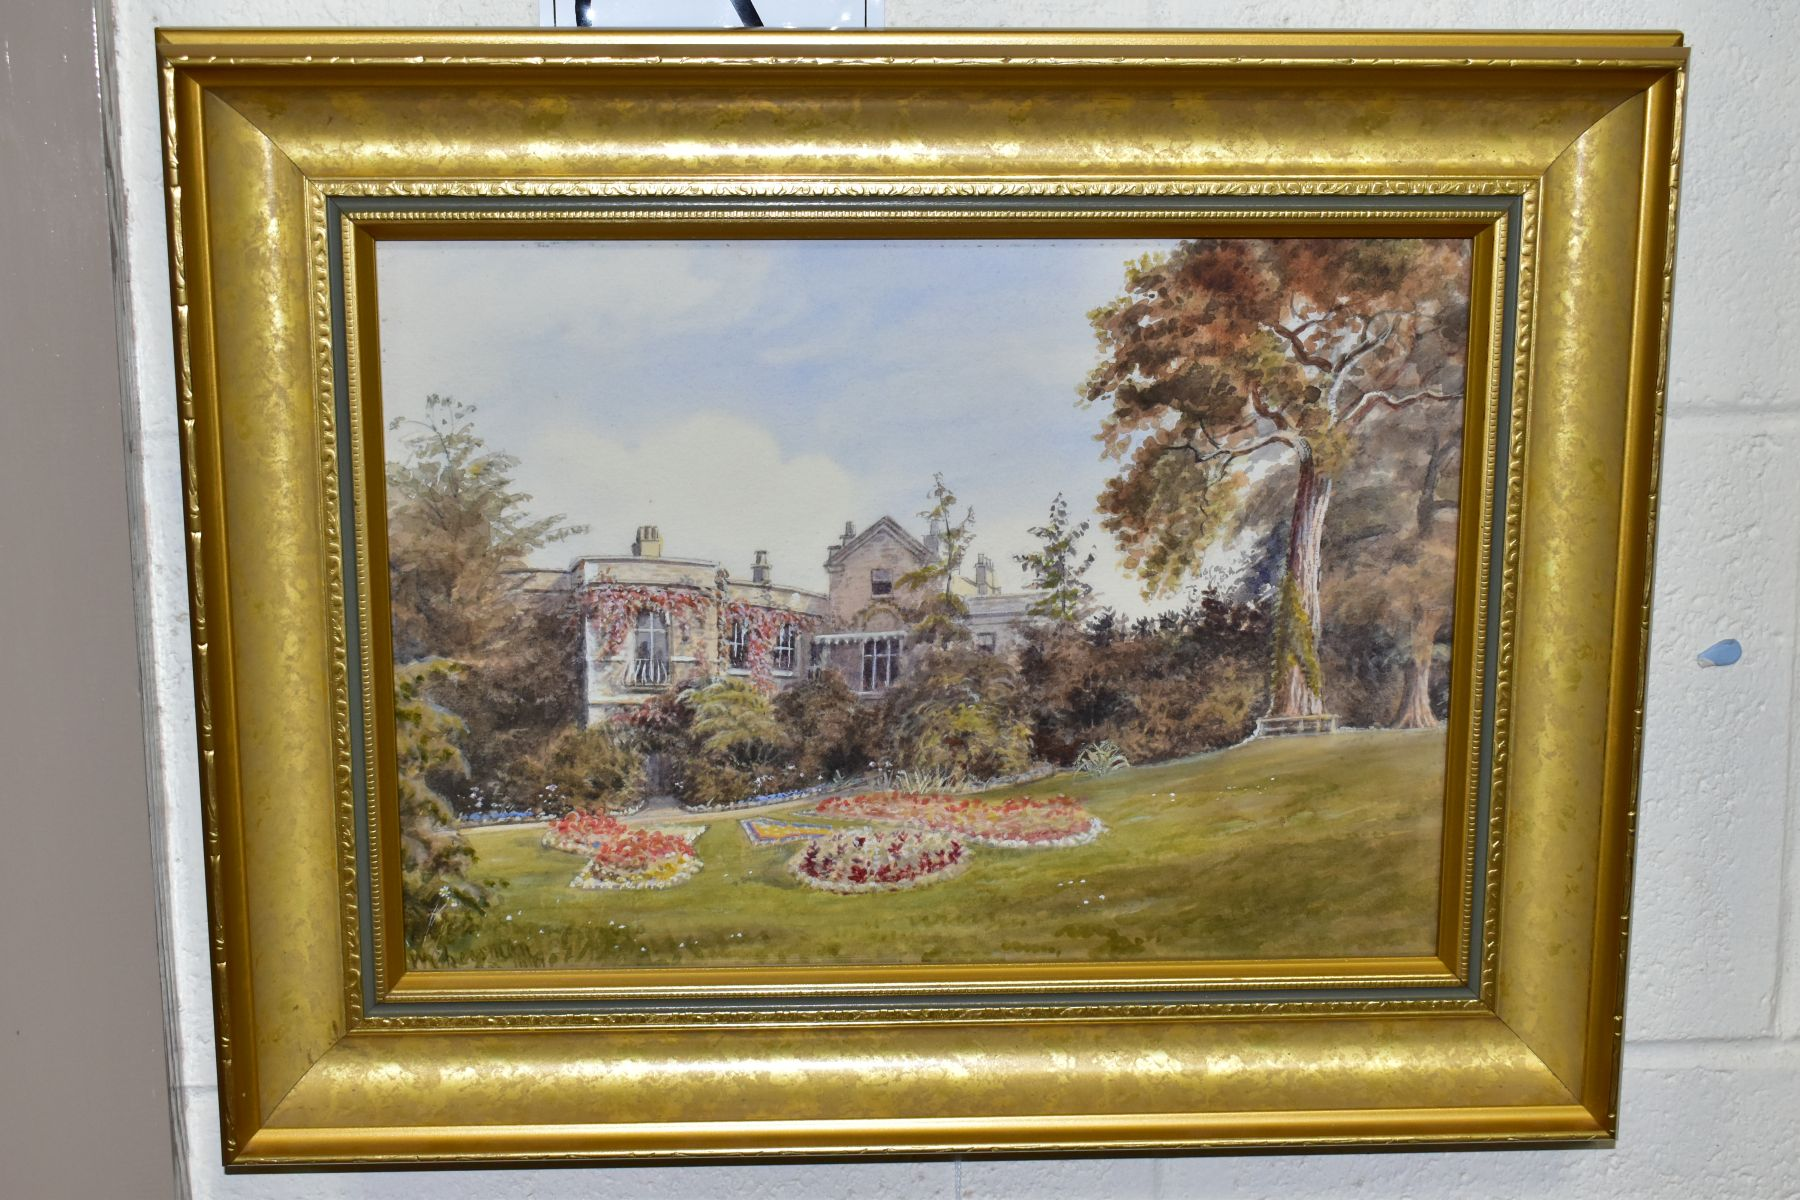 WILLIAM CHEESMAN (CIRCA 1841-1910)'WHITE LODGE, RICHMOND PARK, SURREY'?, a view of a stone built